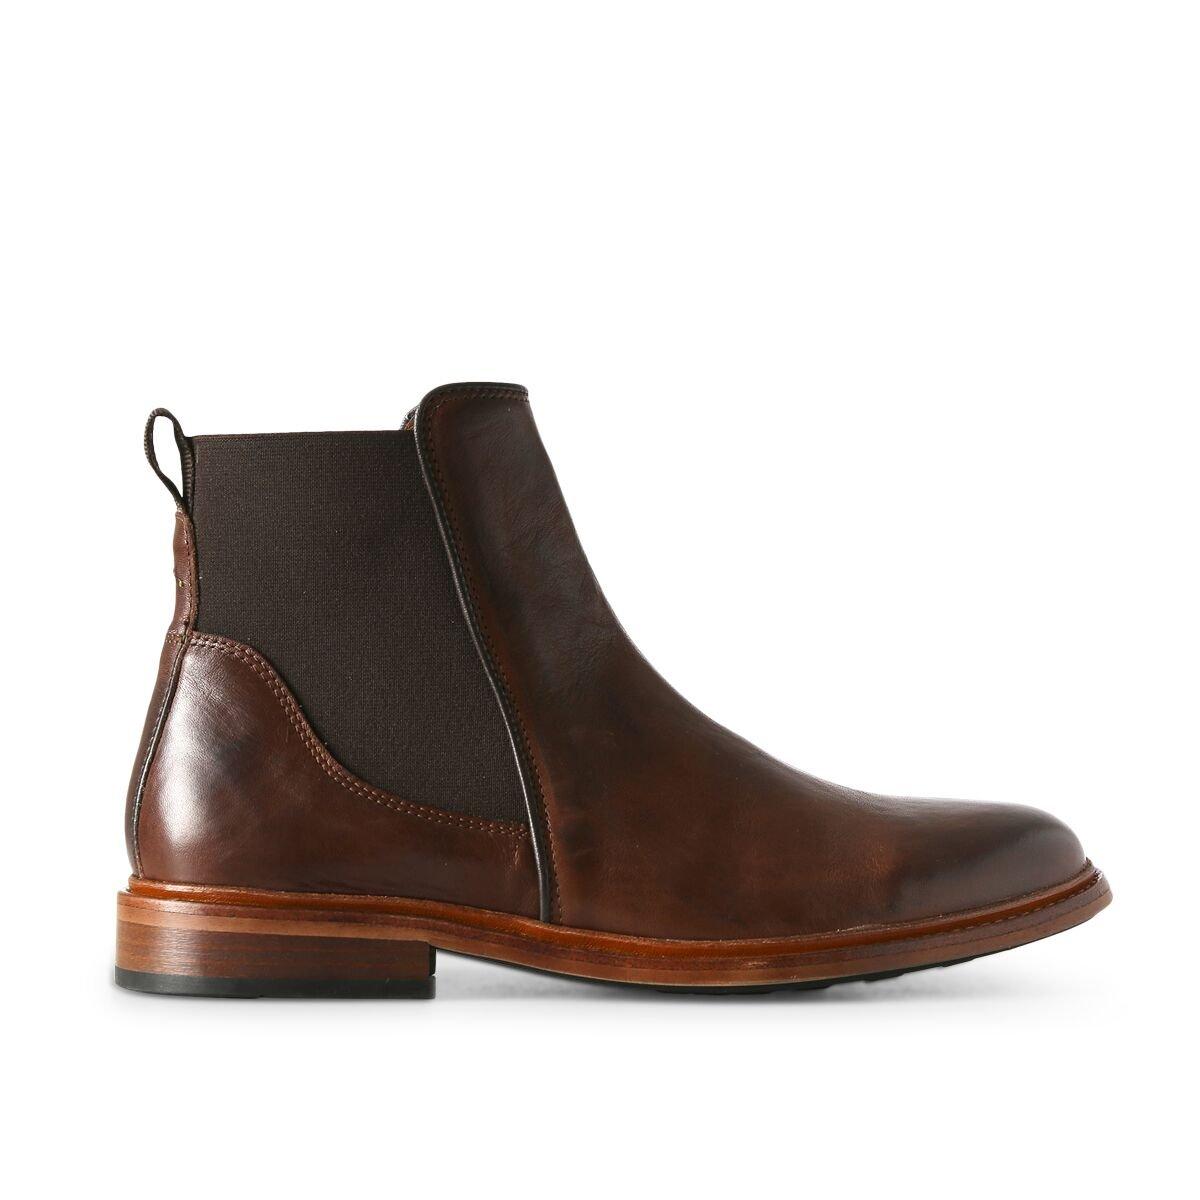 Chelsea L LBottes HommeMarronbrown Shoe The Eu Wyatt Bear 13044 l3FKJT1c